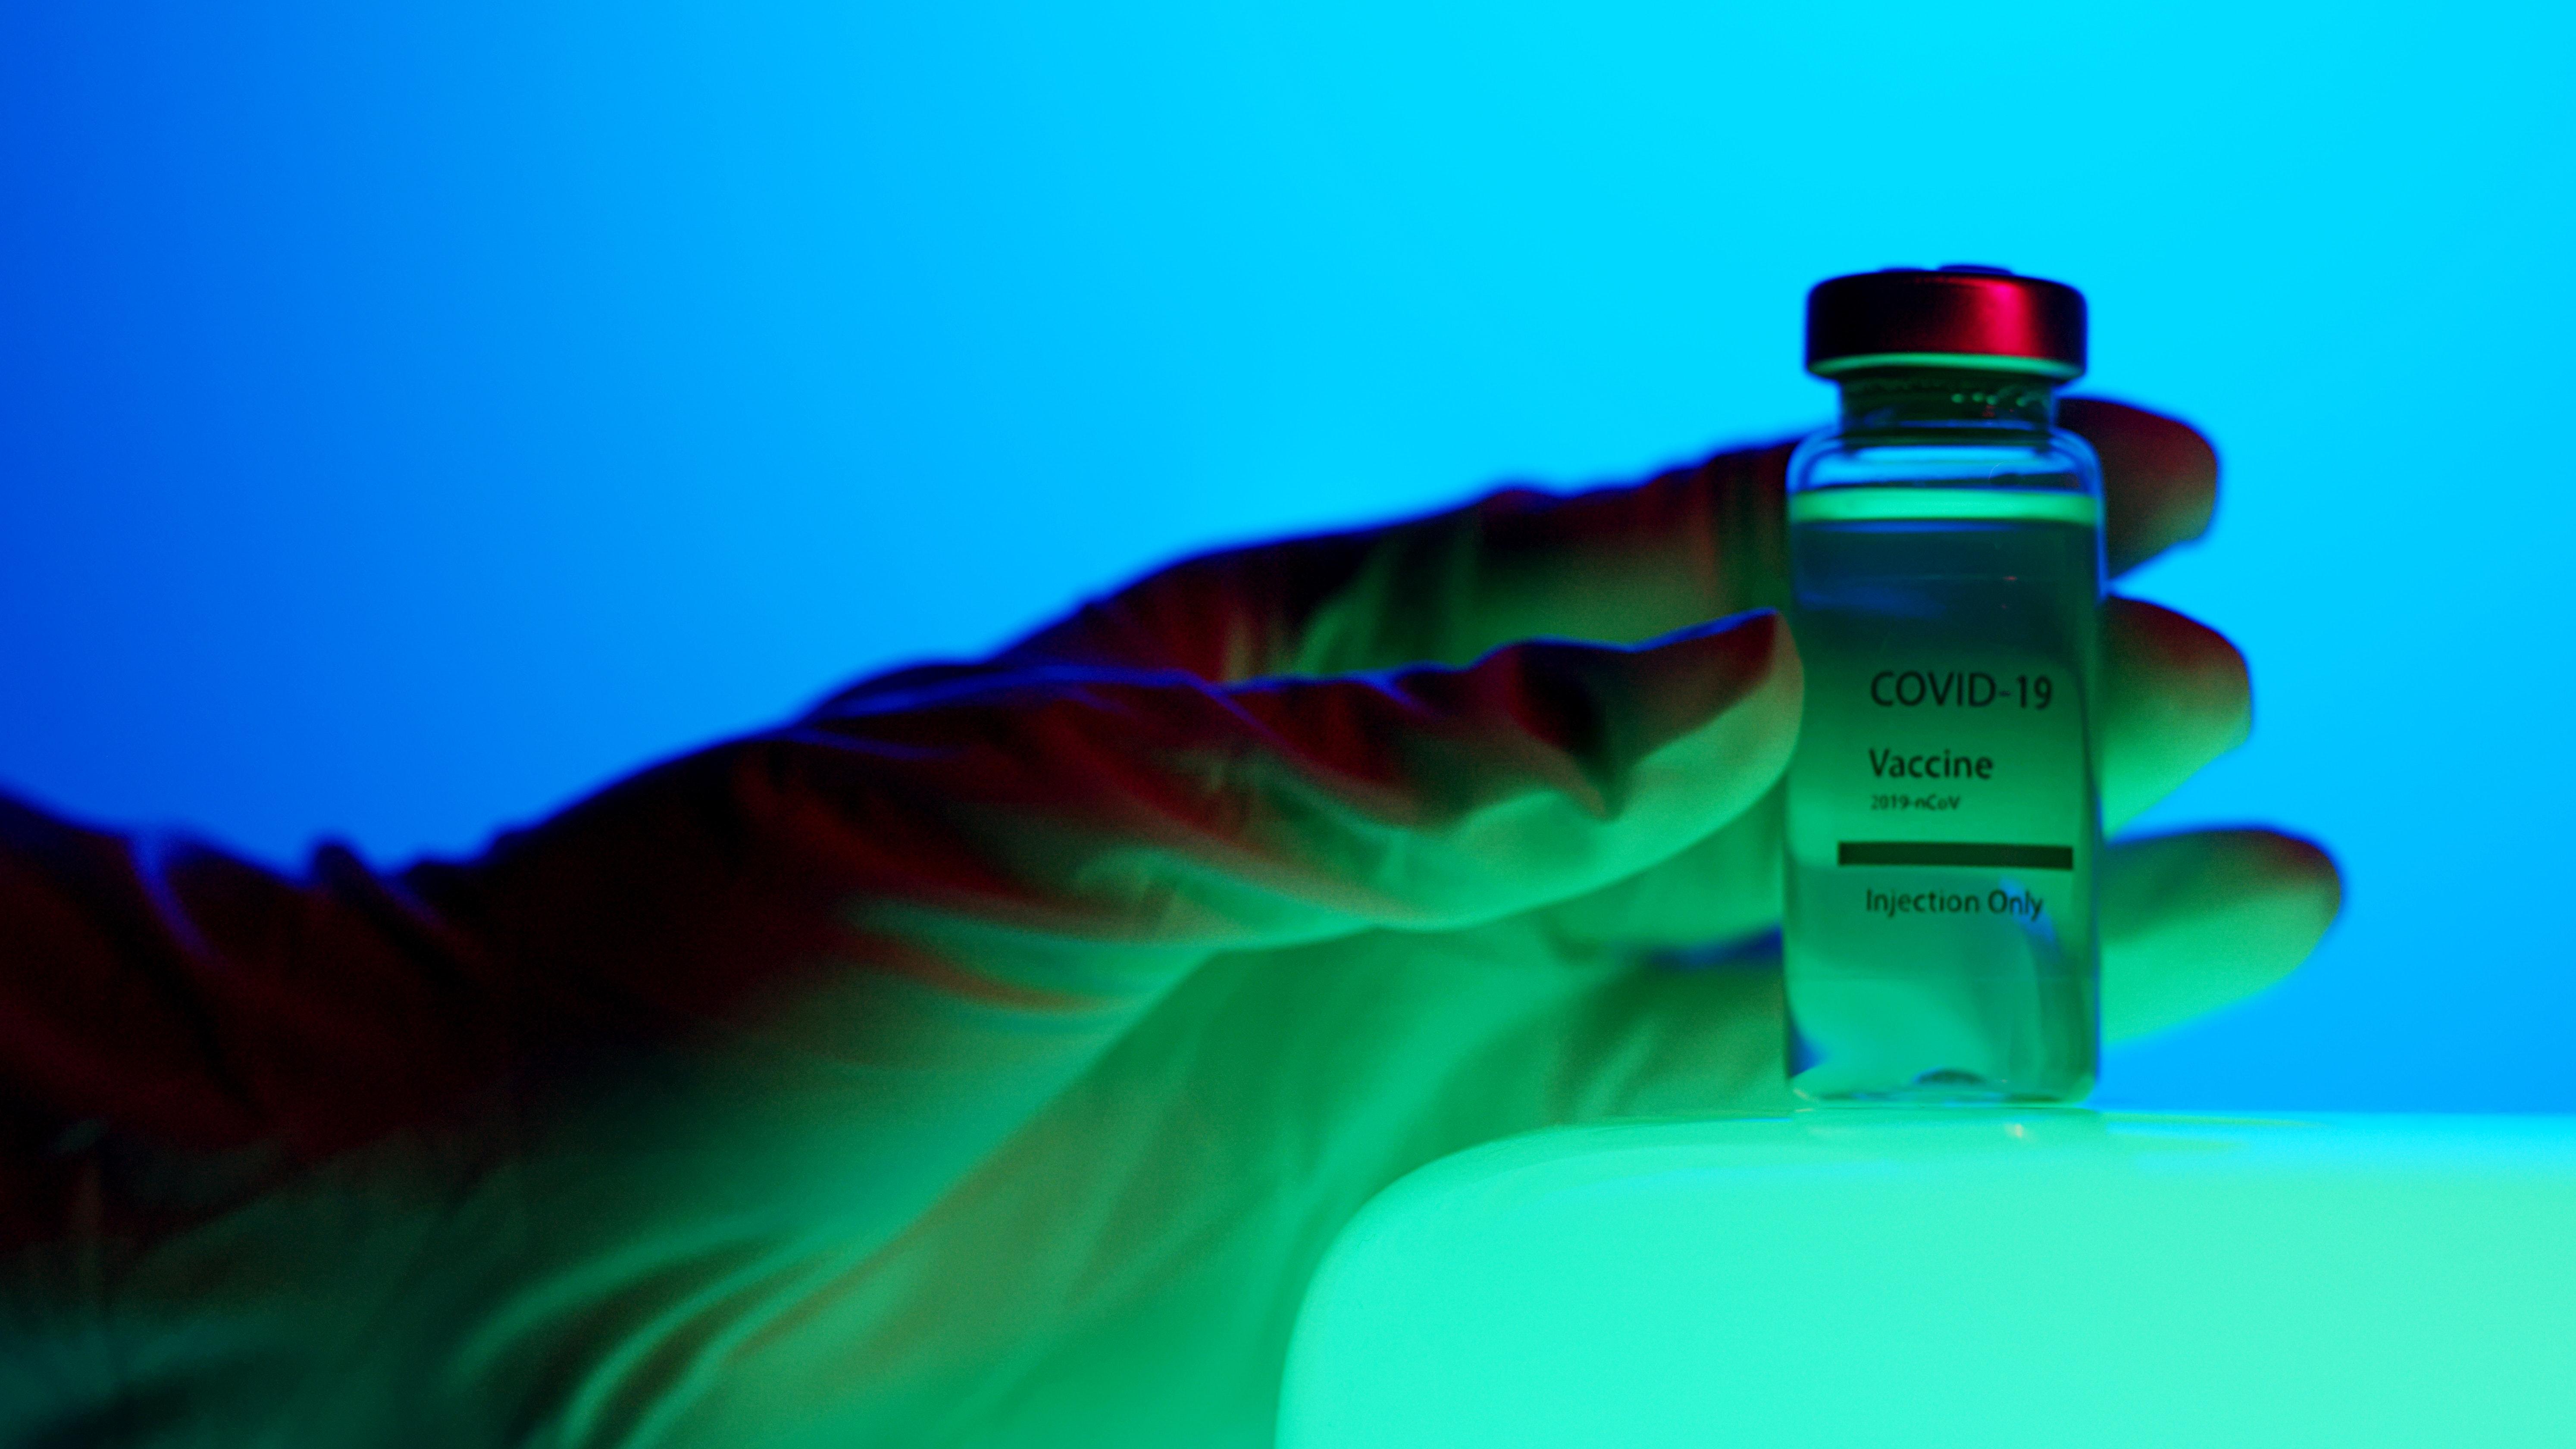 Russia's Coronavirus Vaccine Race Continues